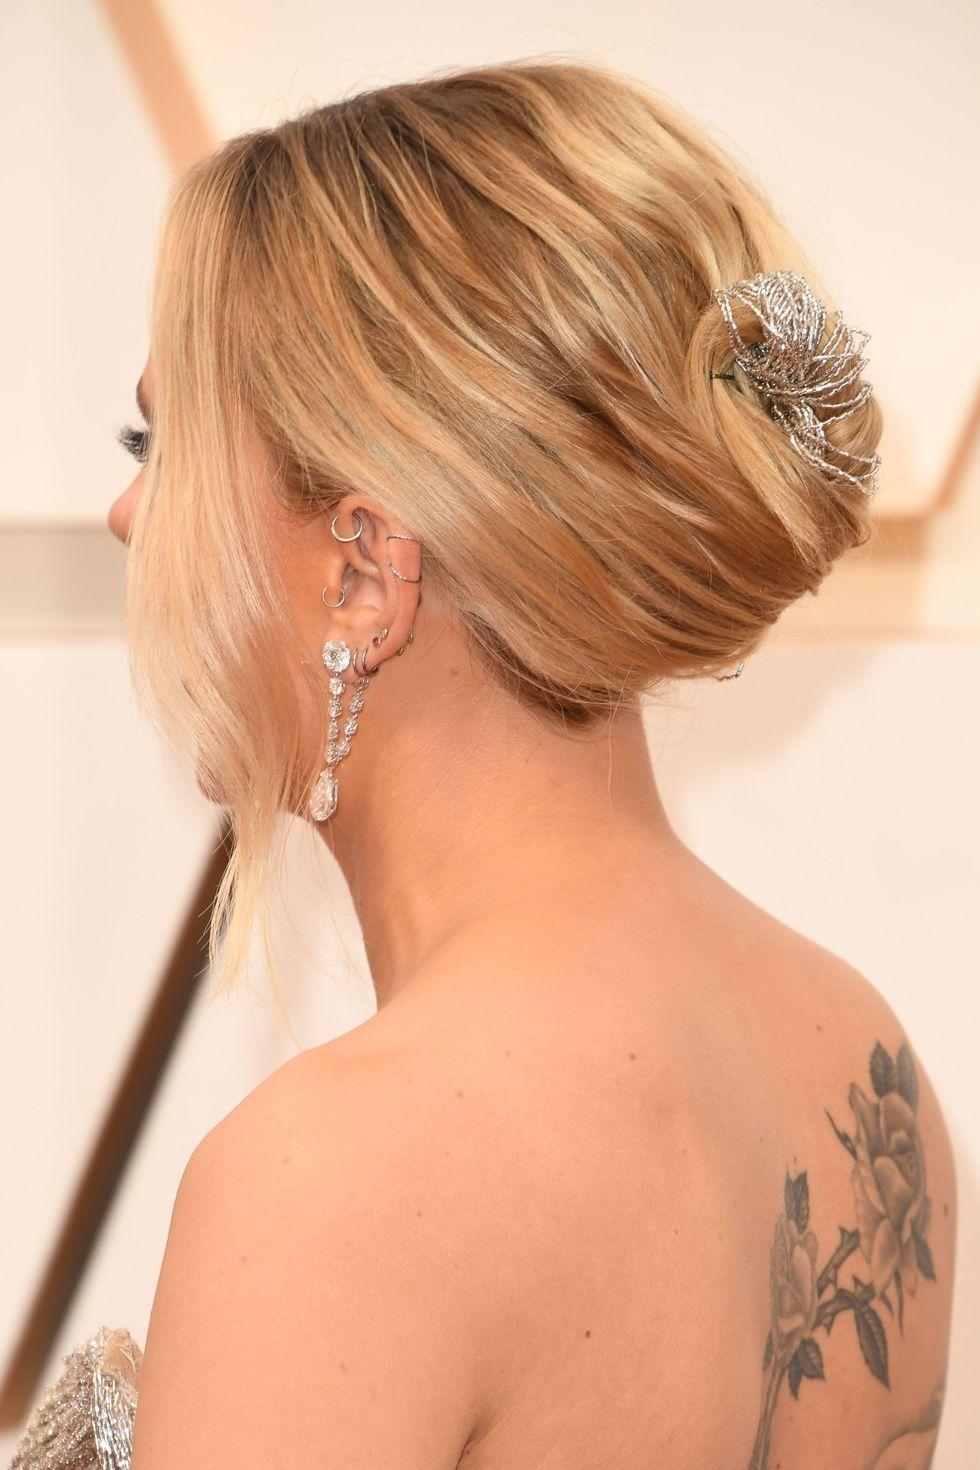 Scarlett Johansson updo χτενισμα